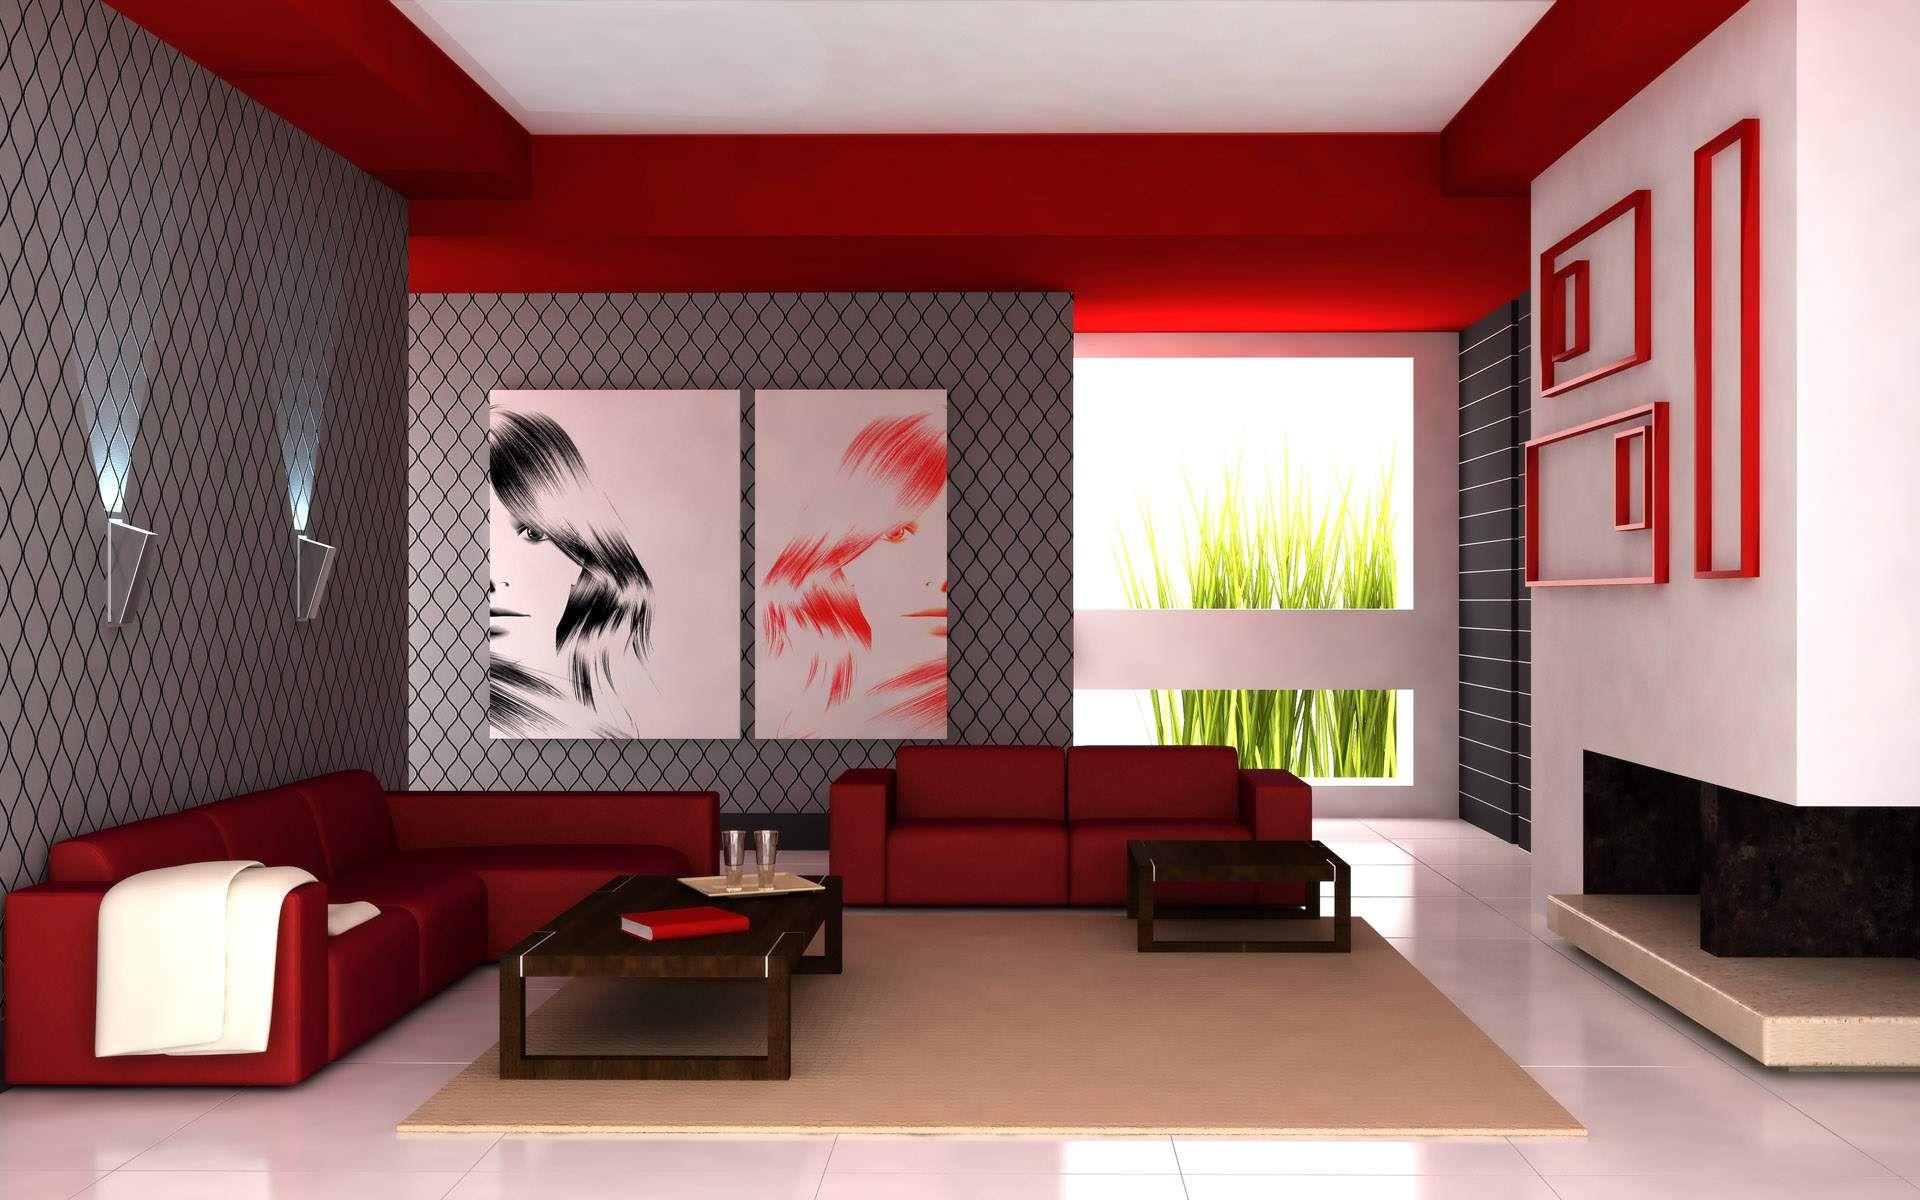 minimalist living | minimalist living room decorating project